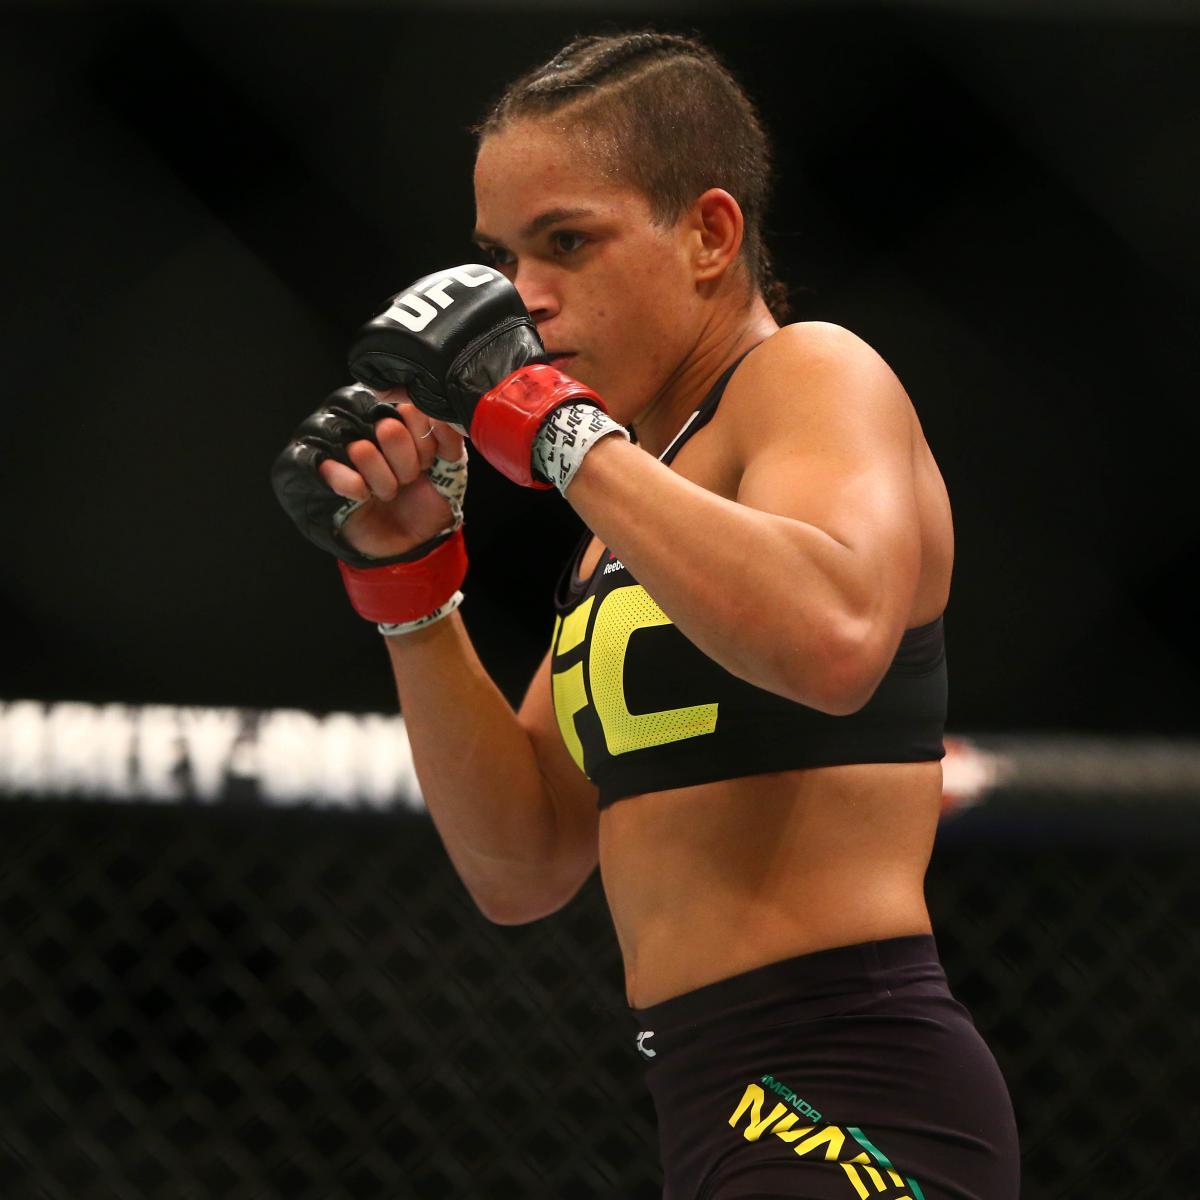 Miesha Tate vs. Amanda Nunes Results: Winner and Knockout